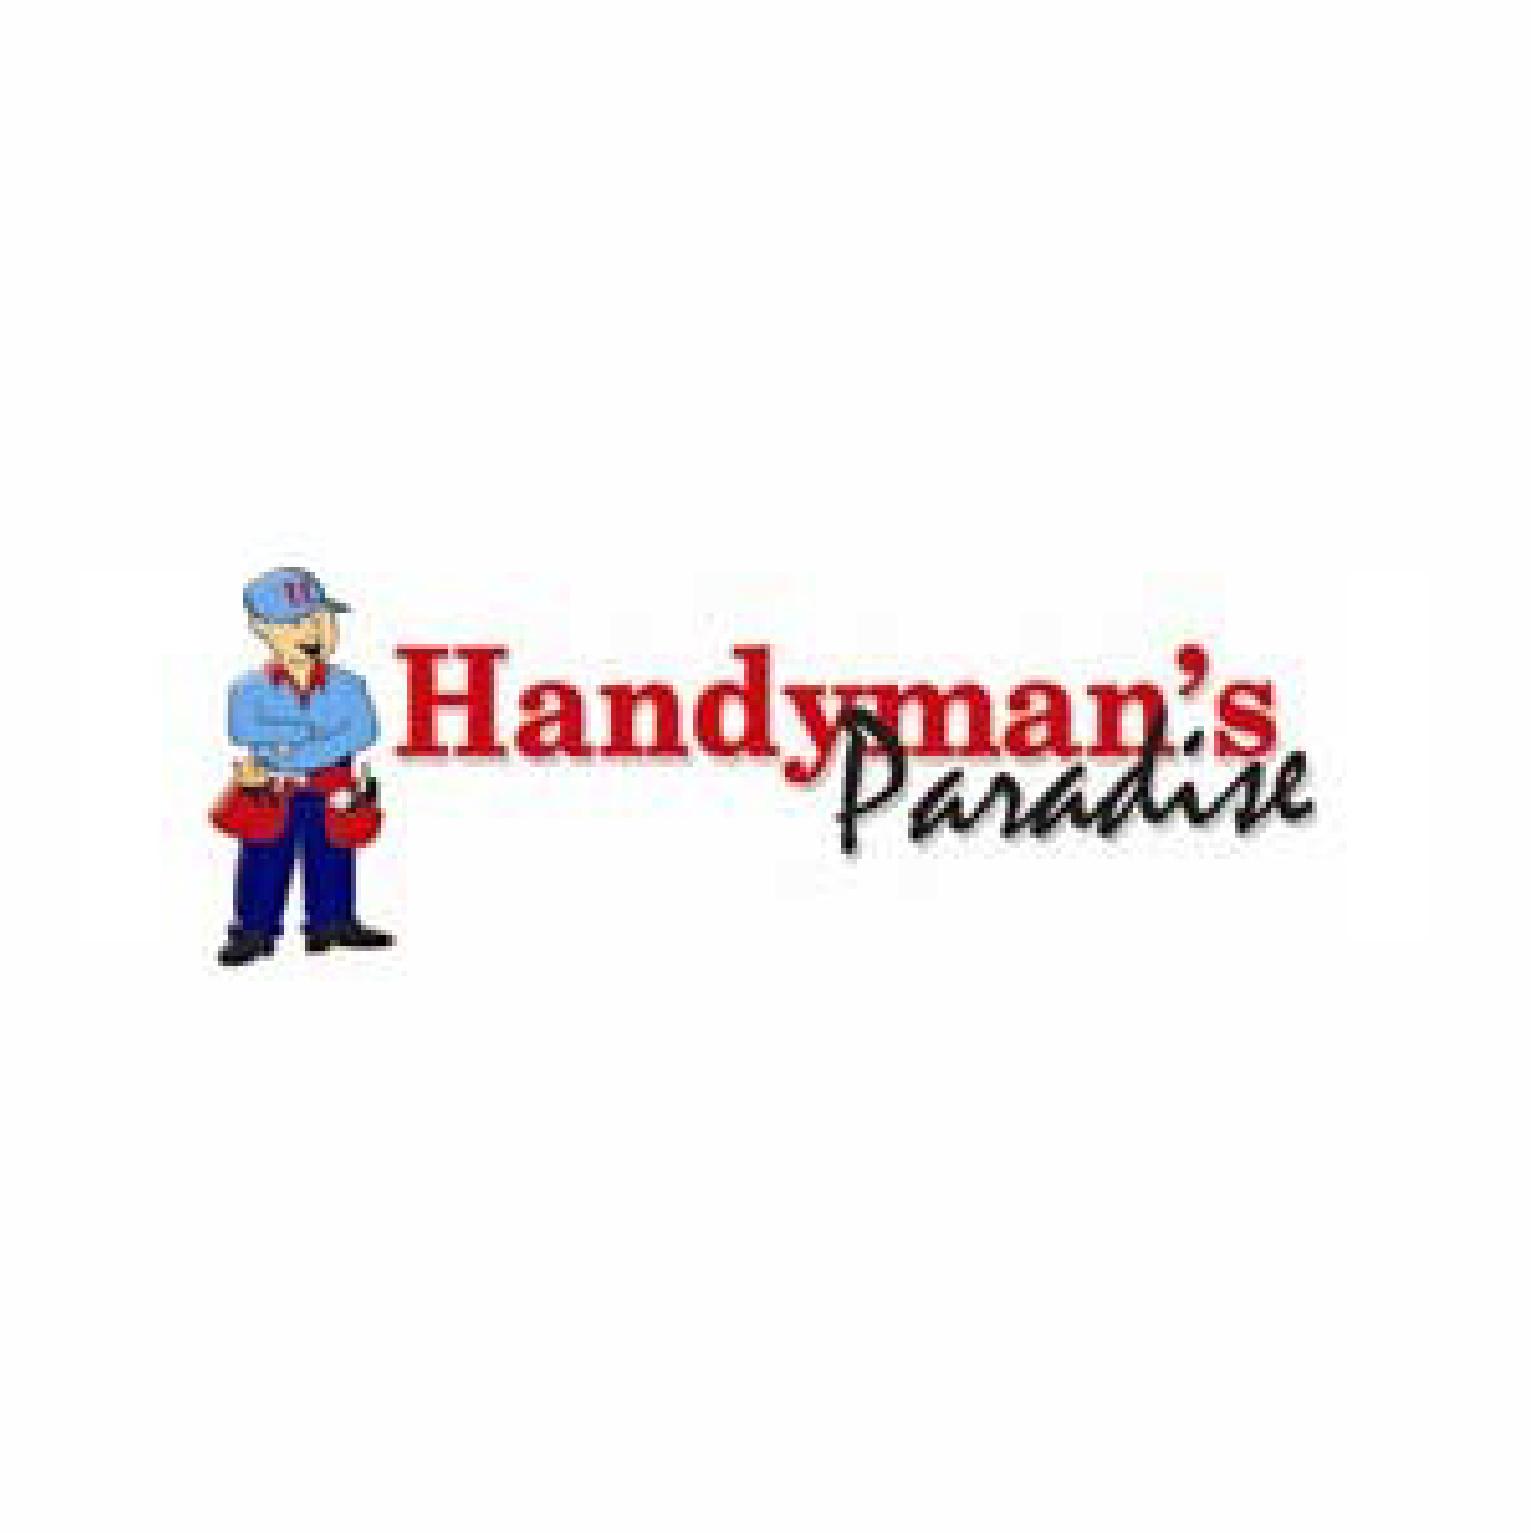 Handyman's Paradise